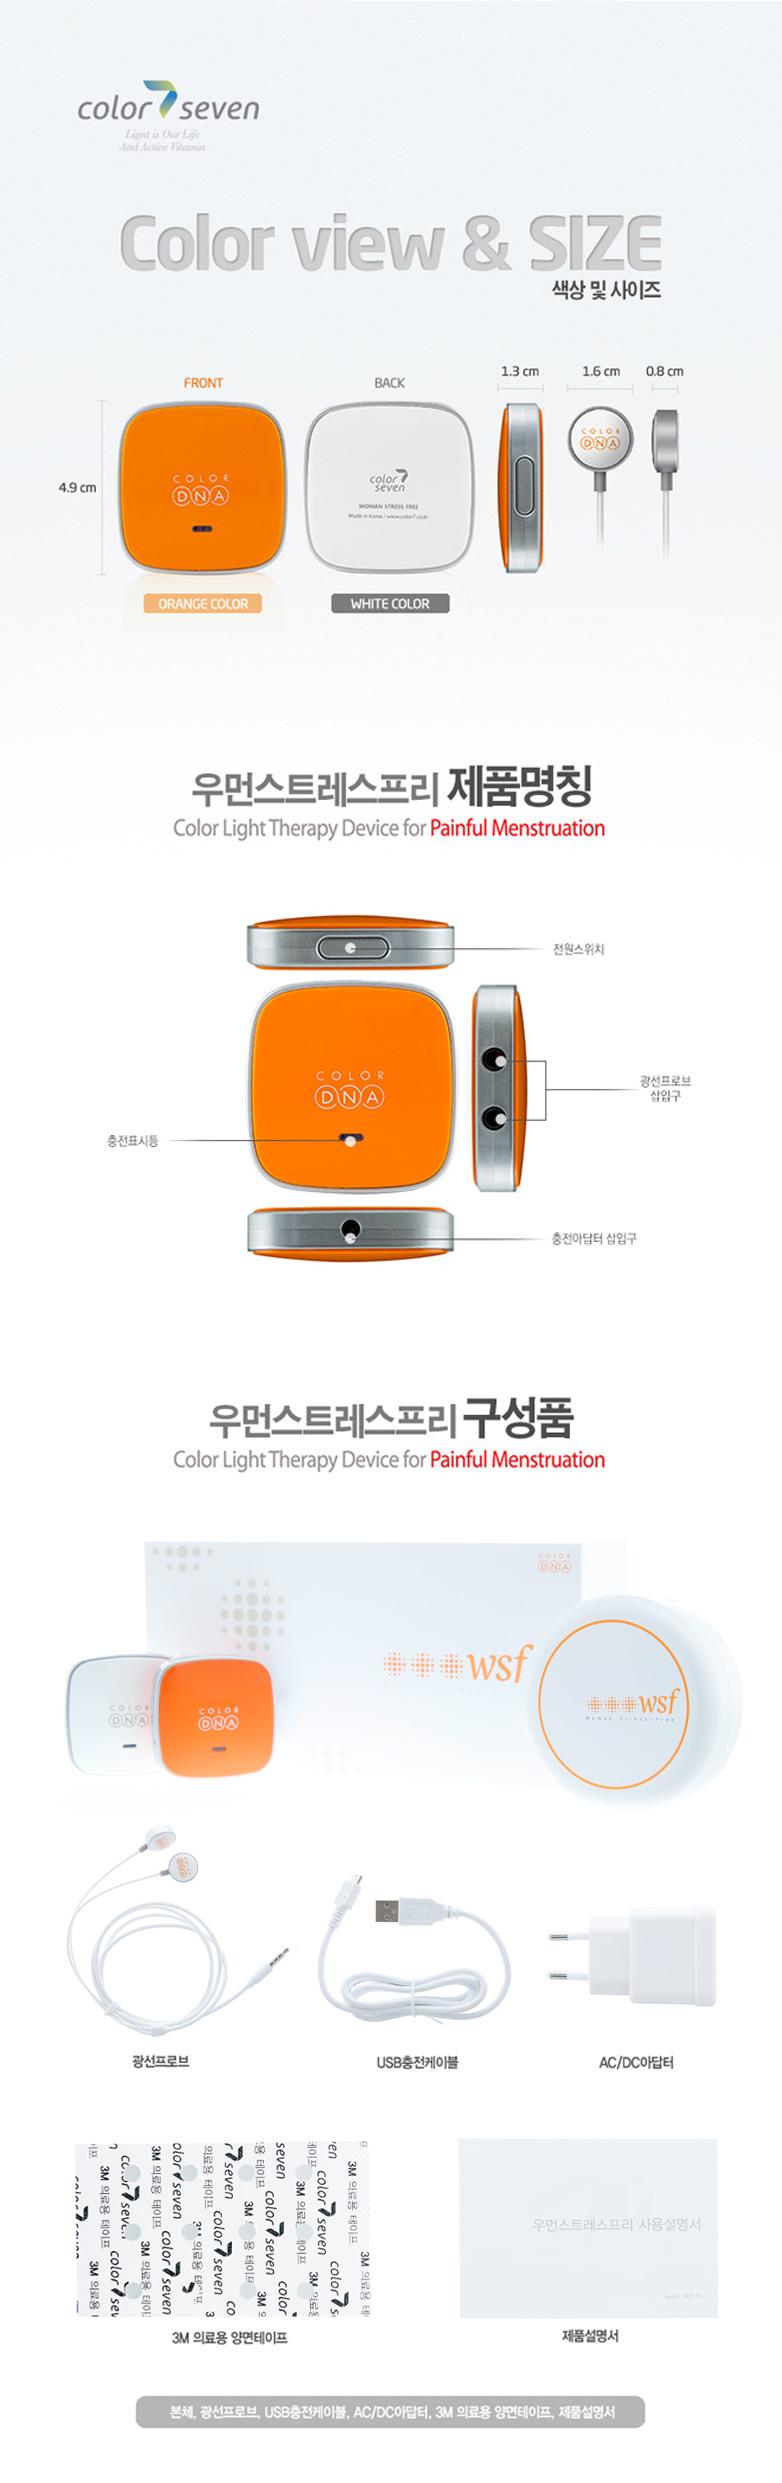 product01_15_1.jpg